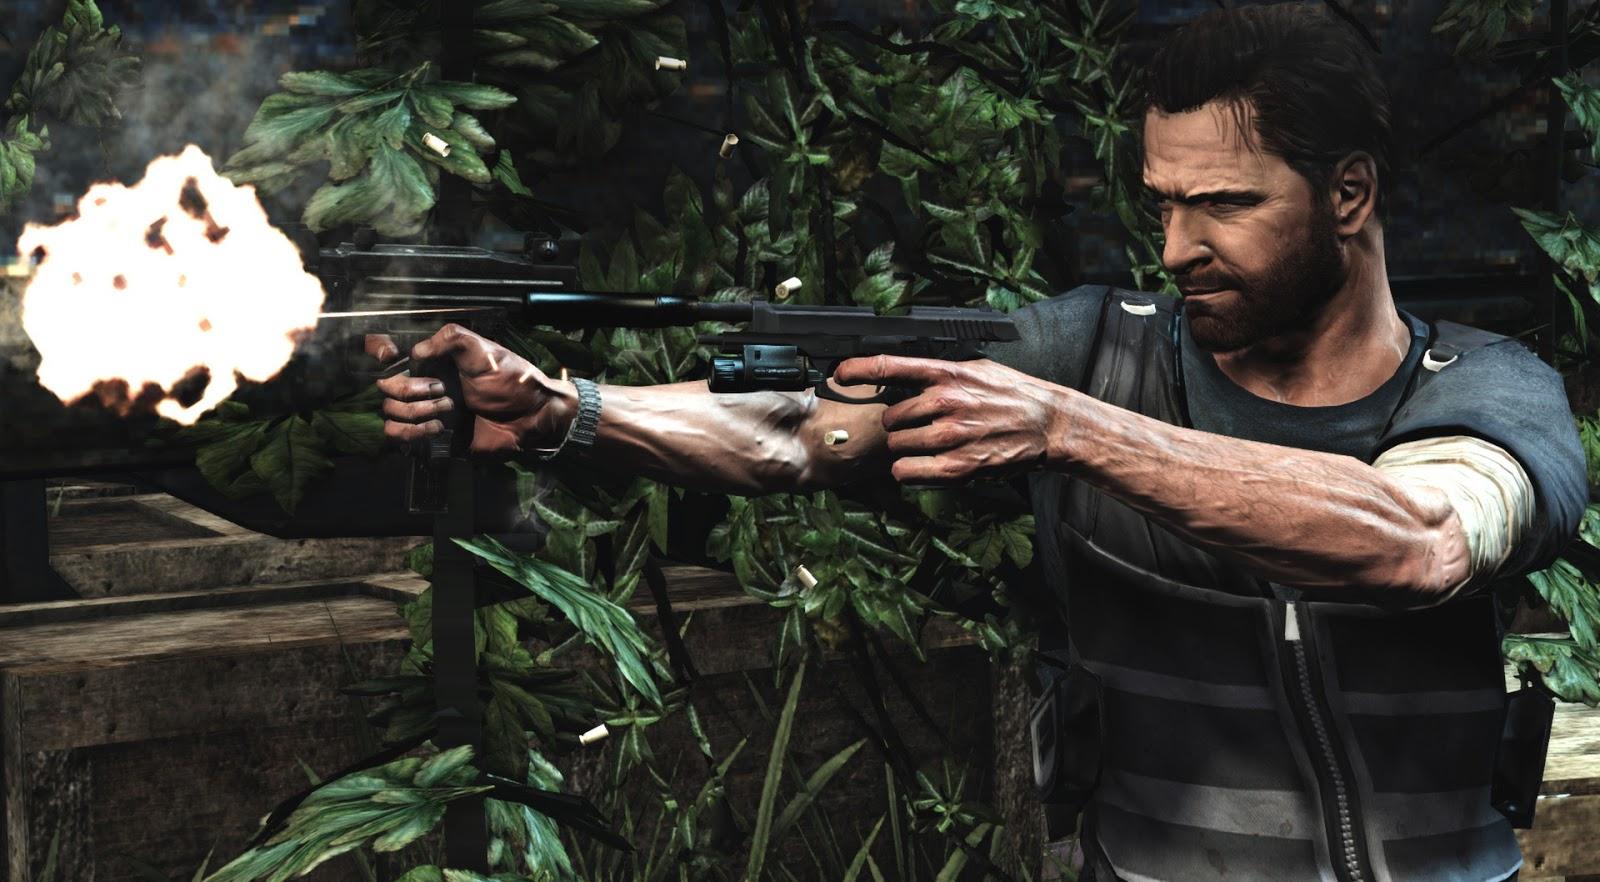 Max Payne 3 Complete Edition ESPAÑOL PC Descargar Full (RELOADED) + REPACK 5 DVD5 (JPW) 4